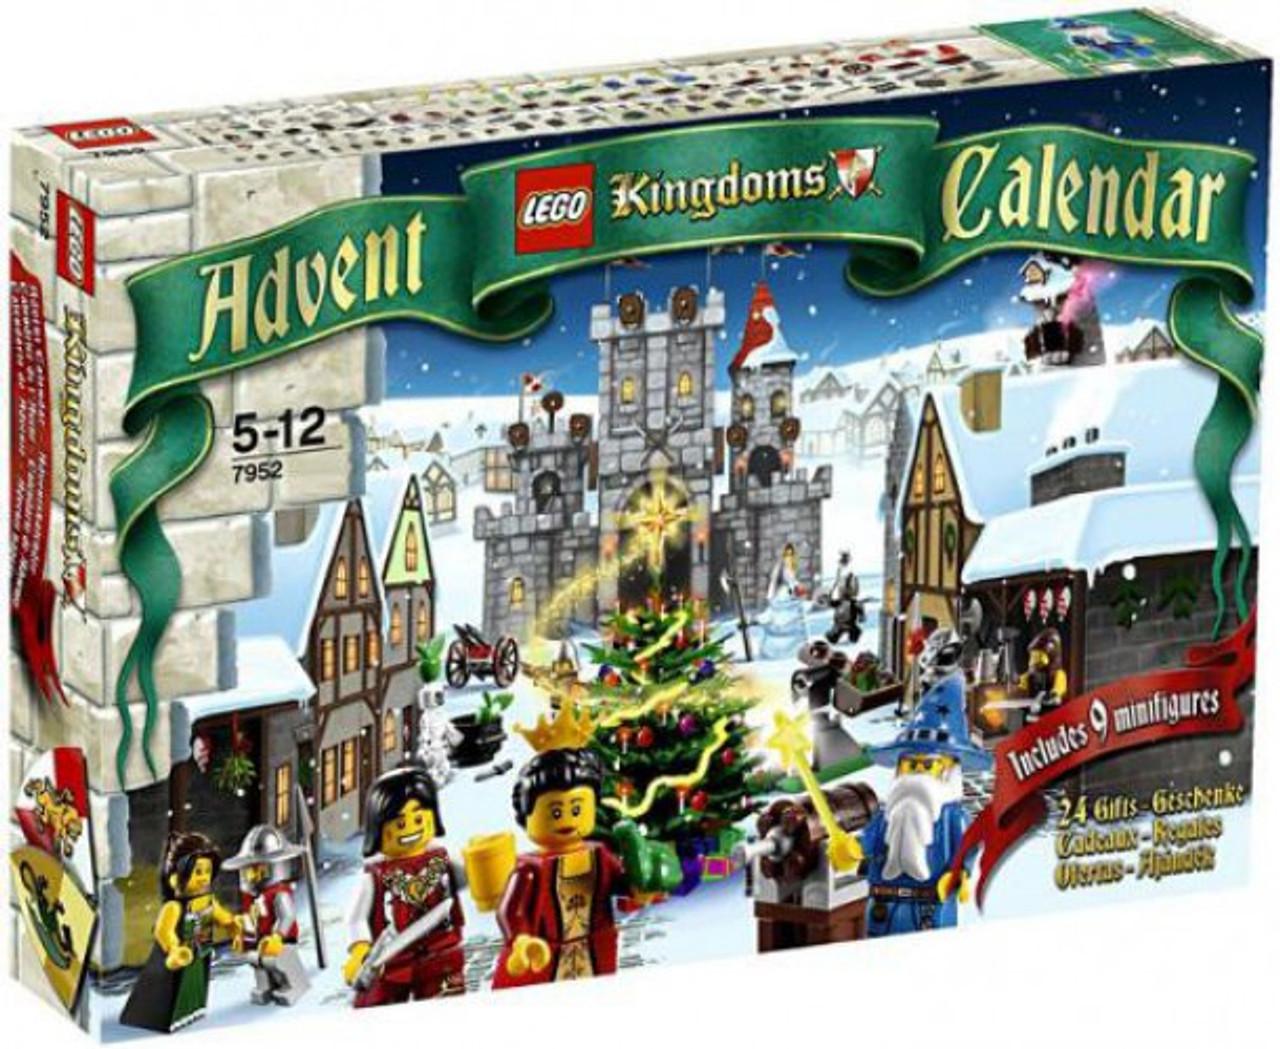 LEGO Kingdoms 2010 Advent Calendar Set #7952